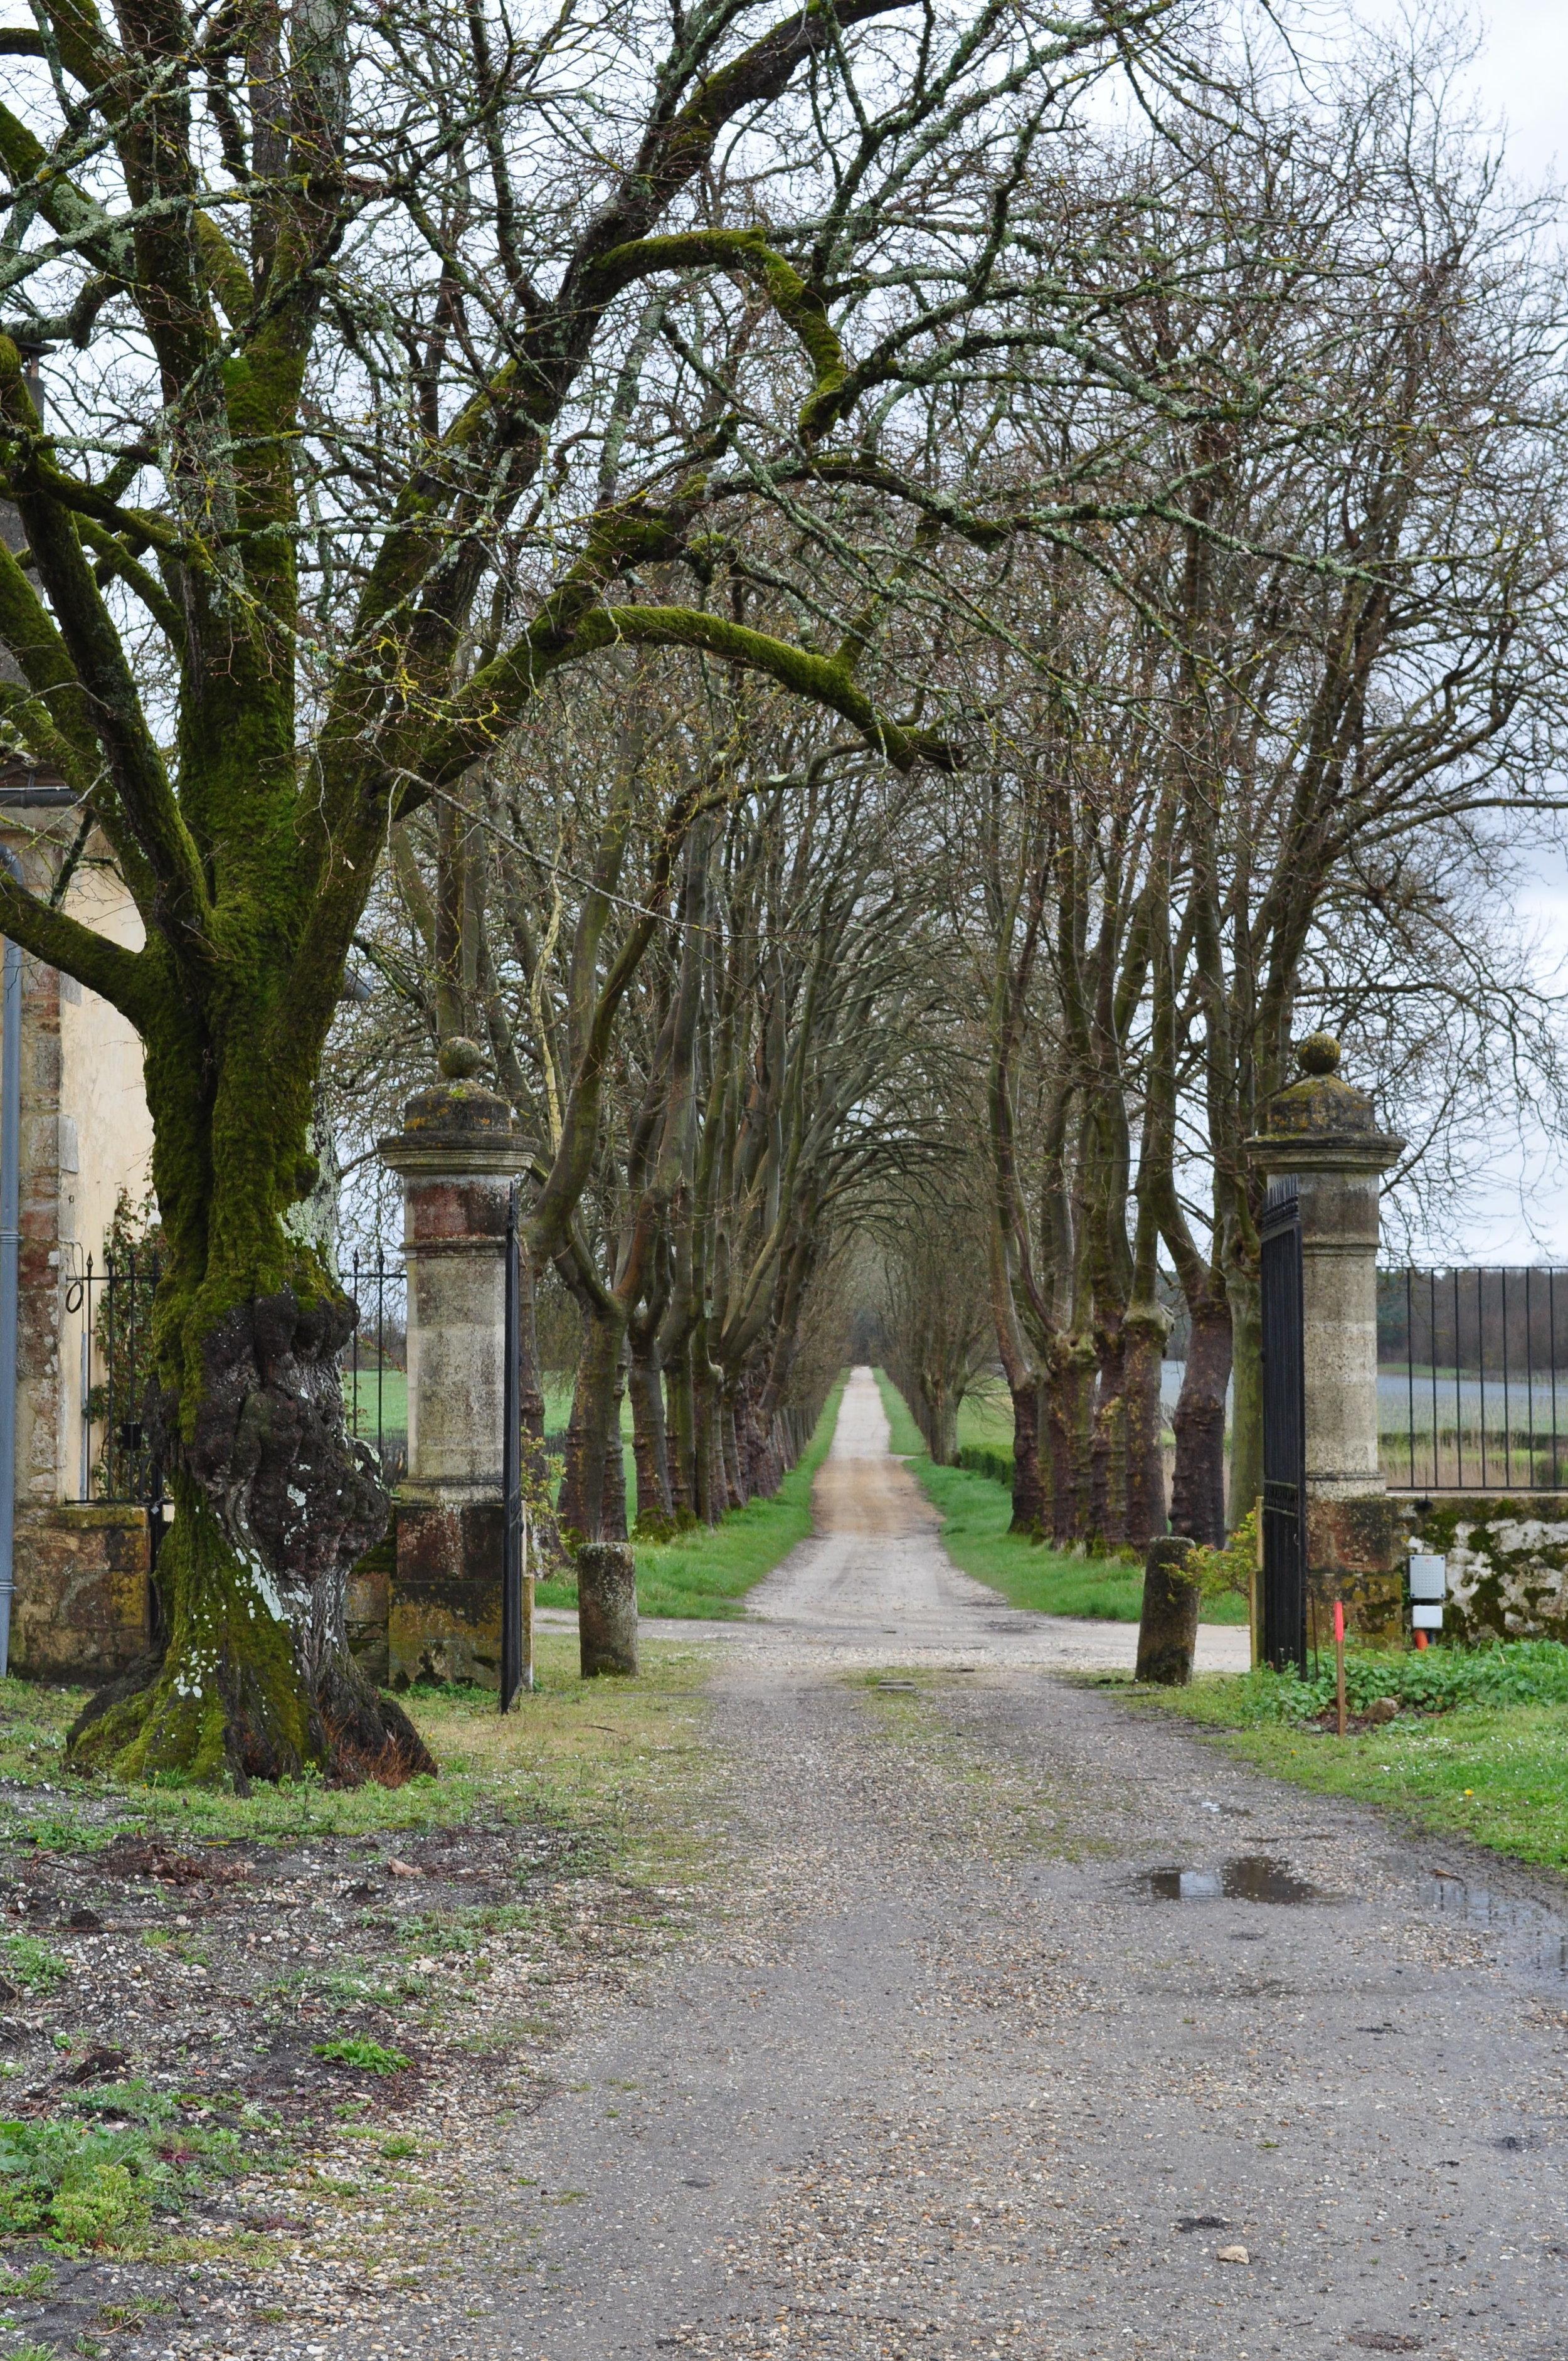 The Roman road at Chateau Guiraud